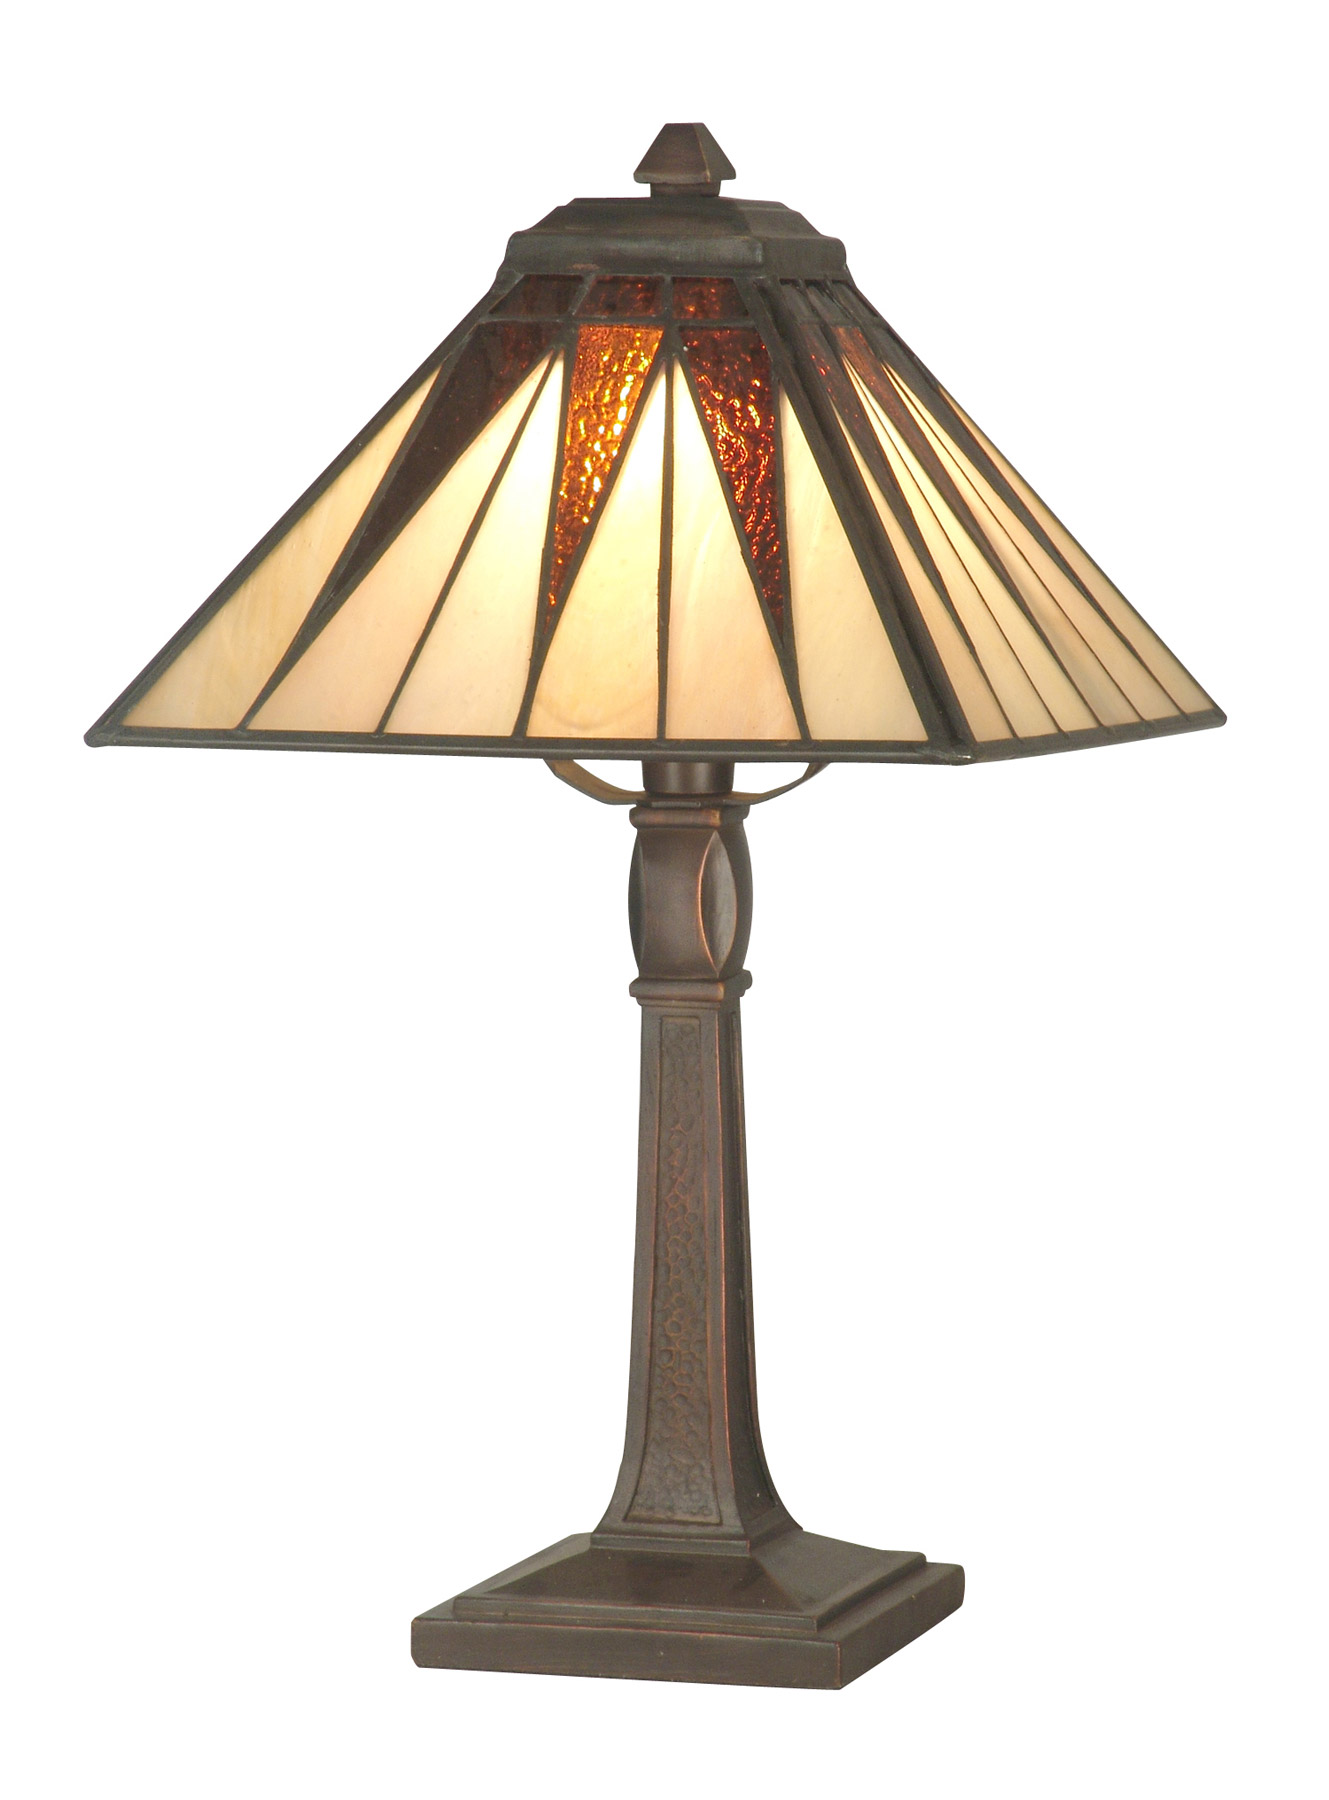 Dale Tiffany Ta70680 Craftsman Cooper Miniature Accent Lamp